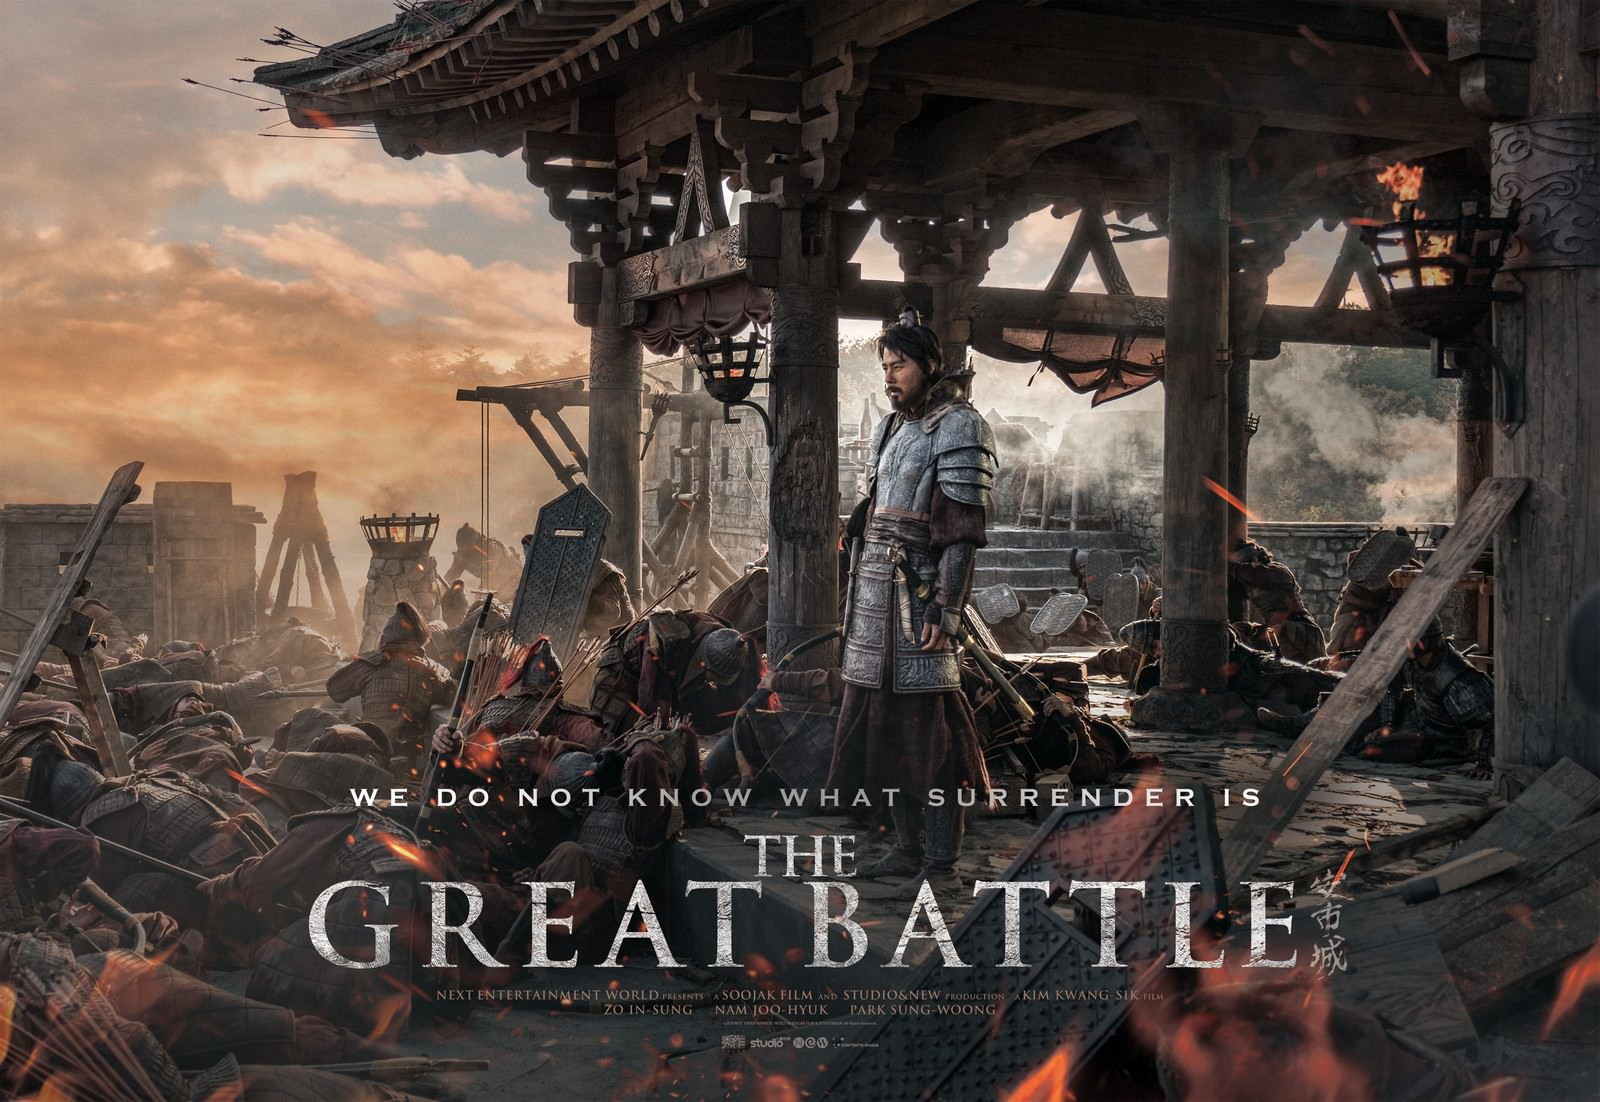 Movie, 안시성(韓國, 2018) / 浴血圍城88天(台灣) / 安市城(香港) / The Great Battle(英文), 電影海報, 韓國, 橫版